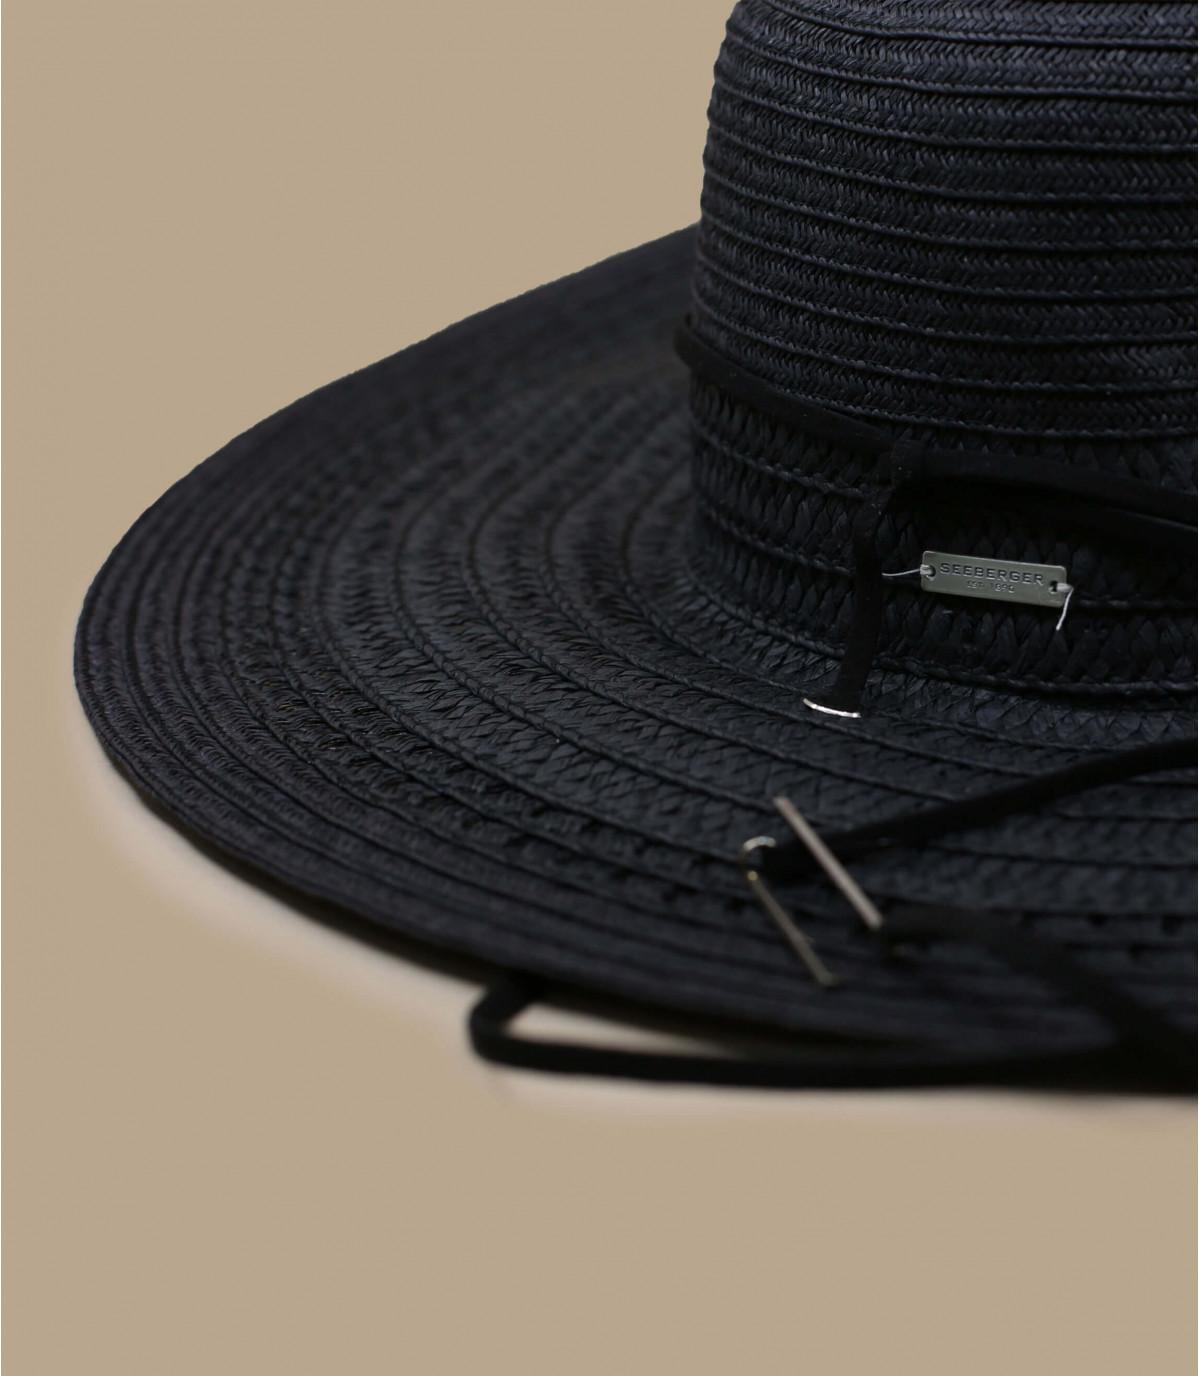 Details Fedora leather band black - Abbildung 2